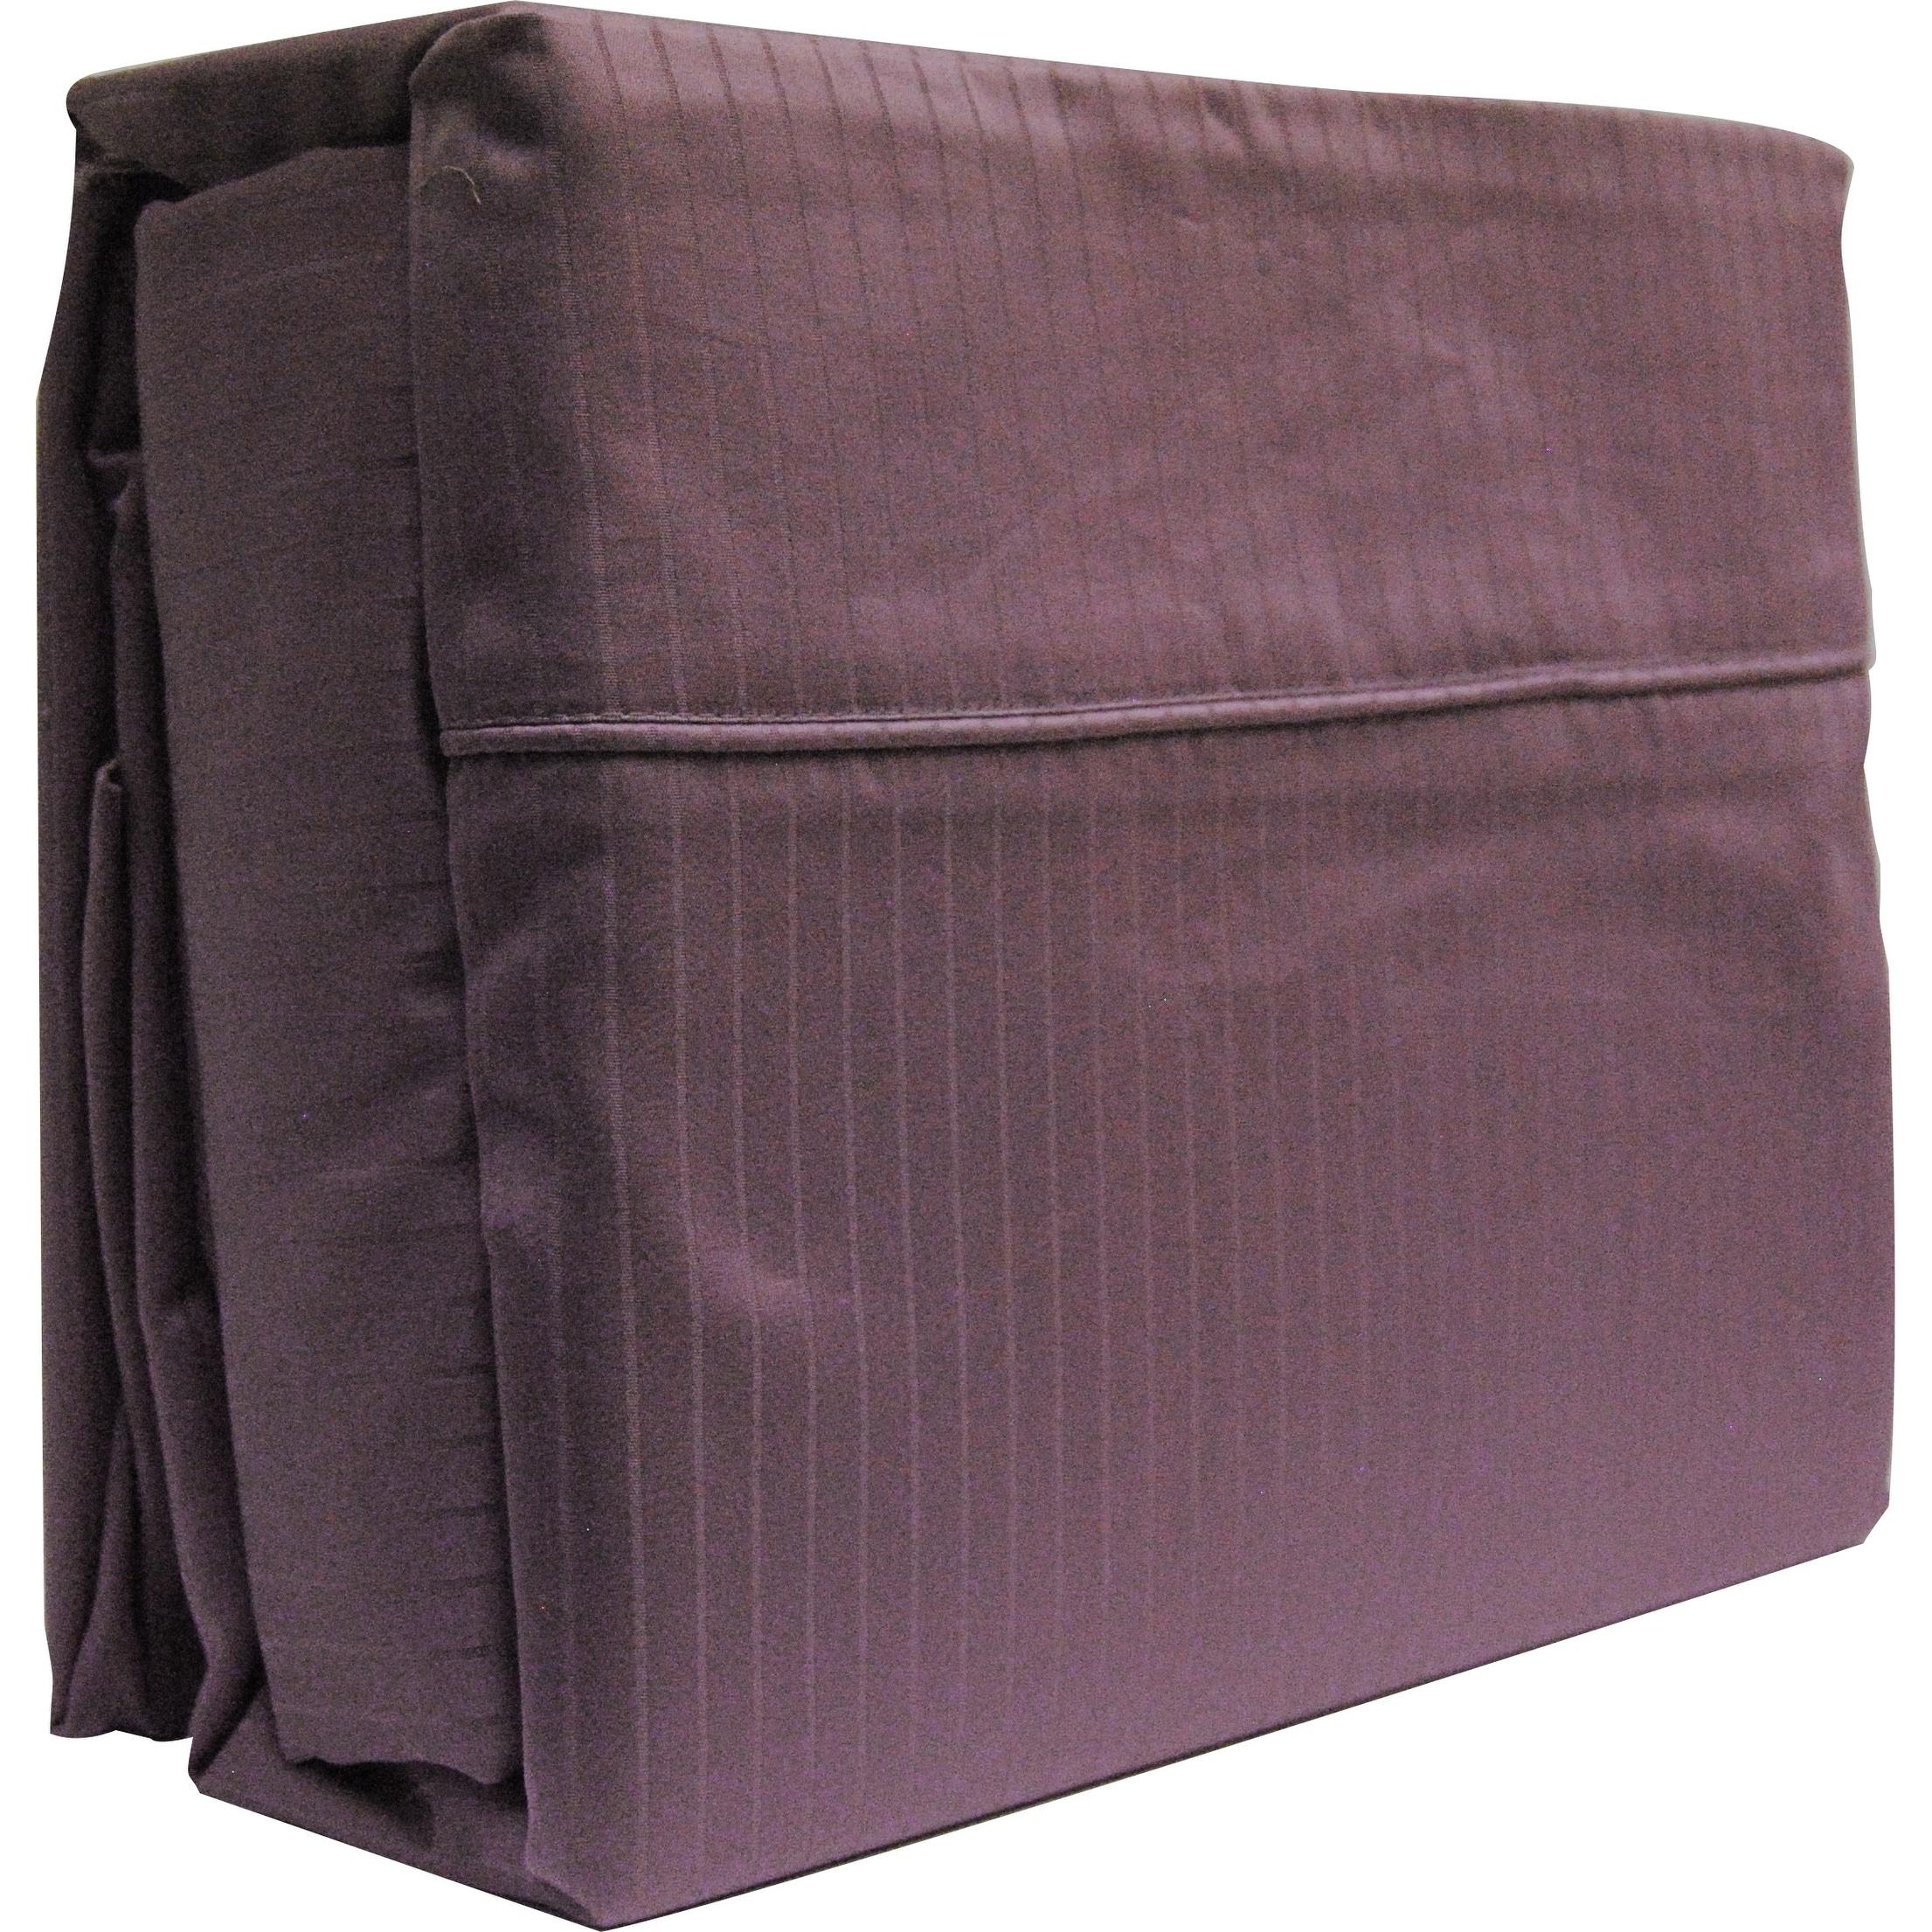 Lavender Stripe King Sheet Set 4 Piece 800 Thread Count Egyptian Cotton